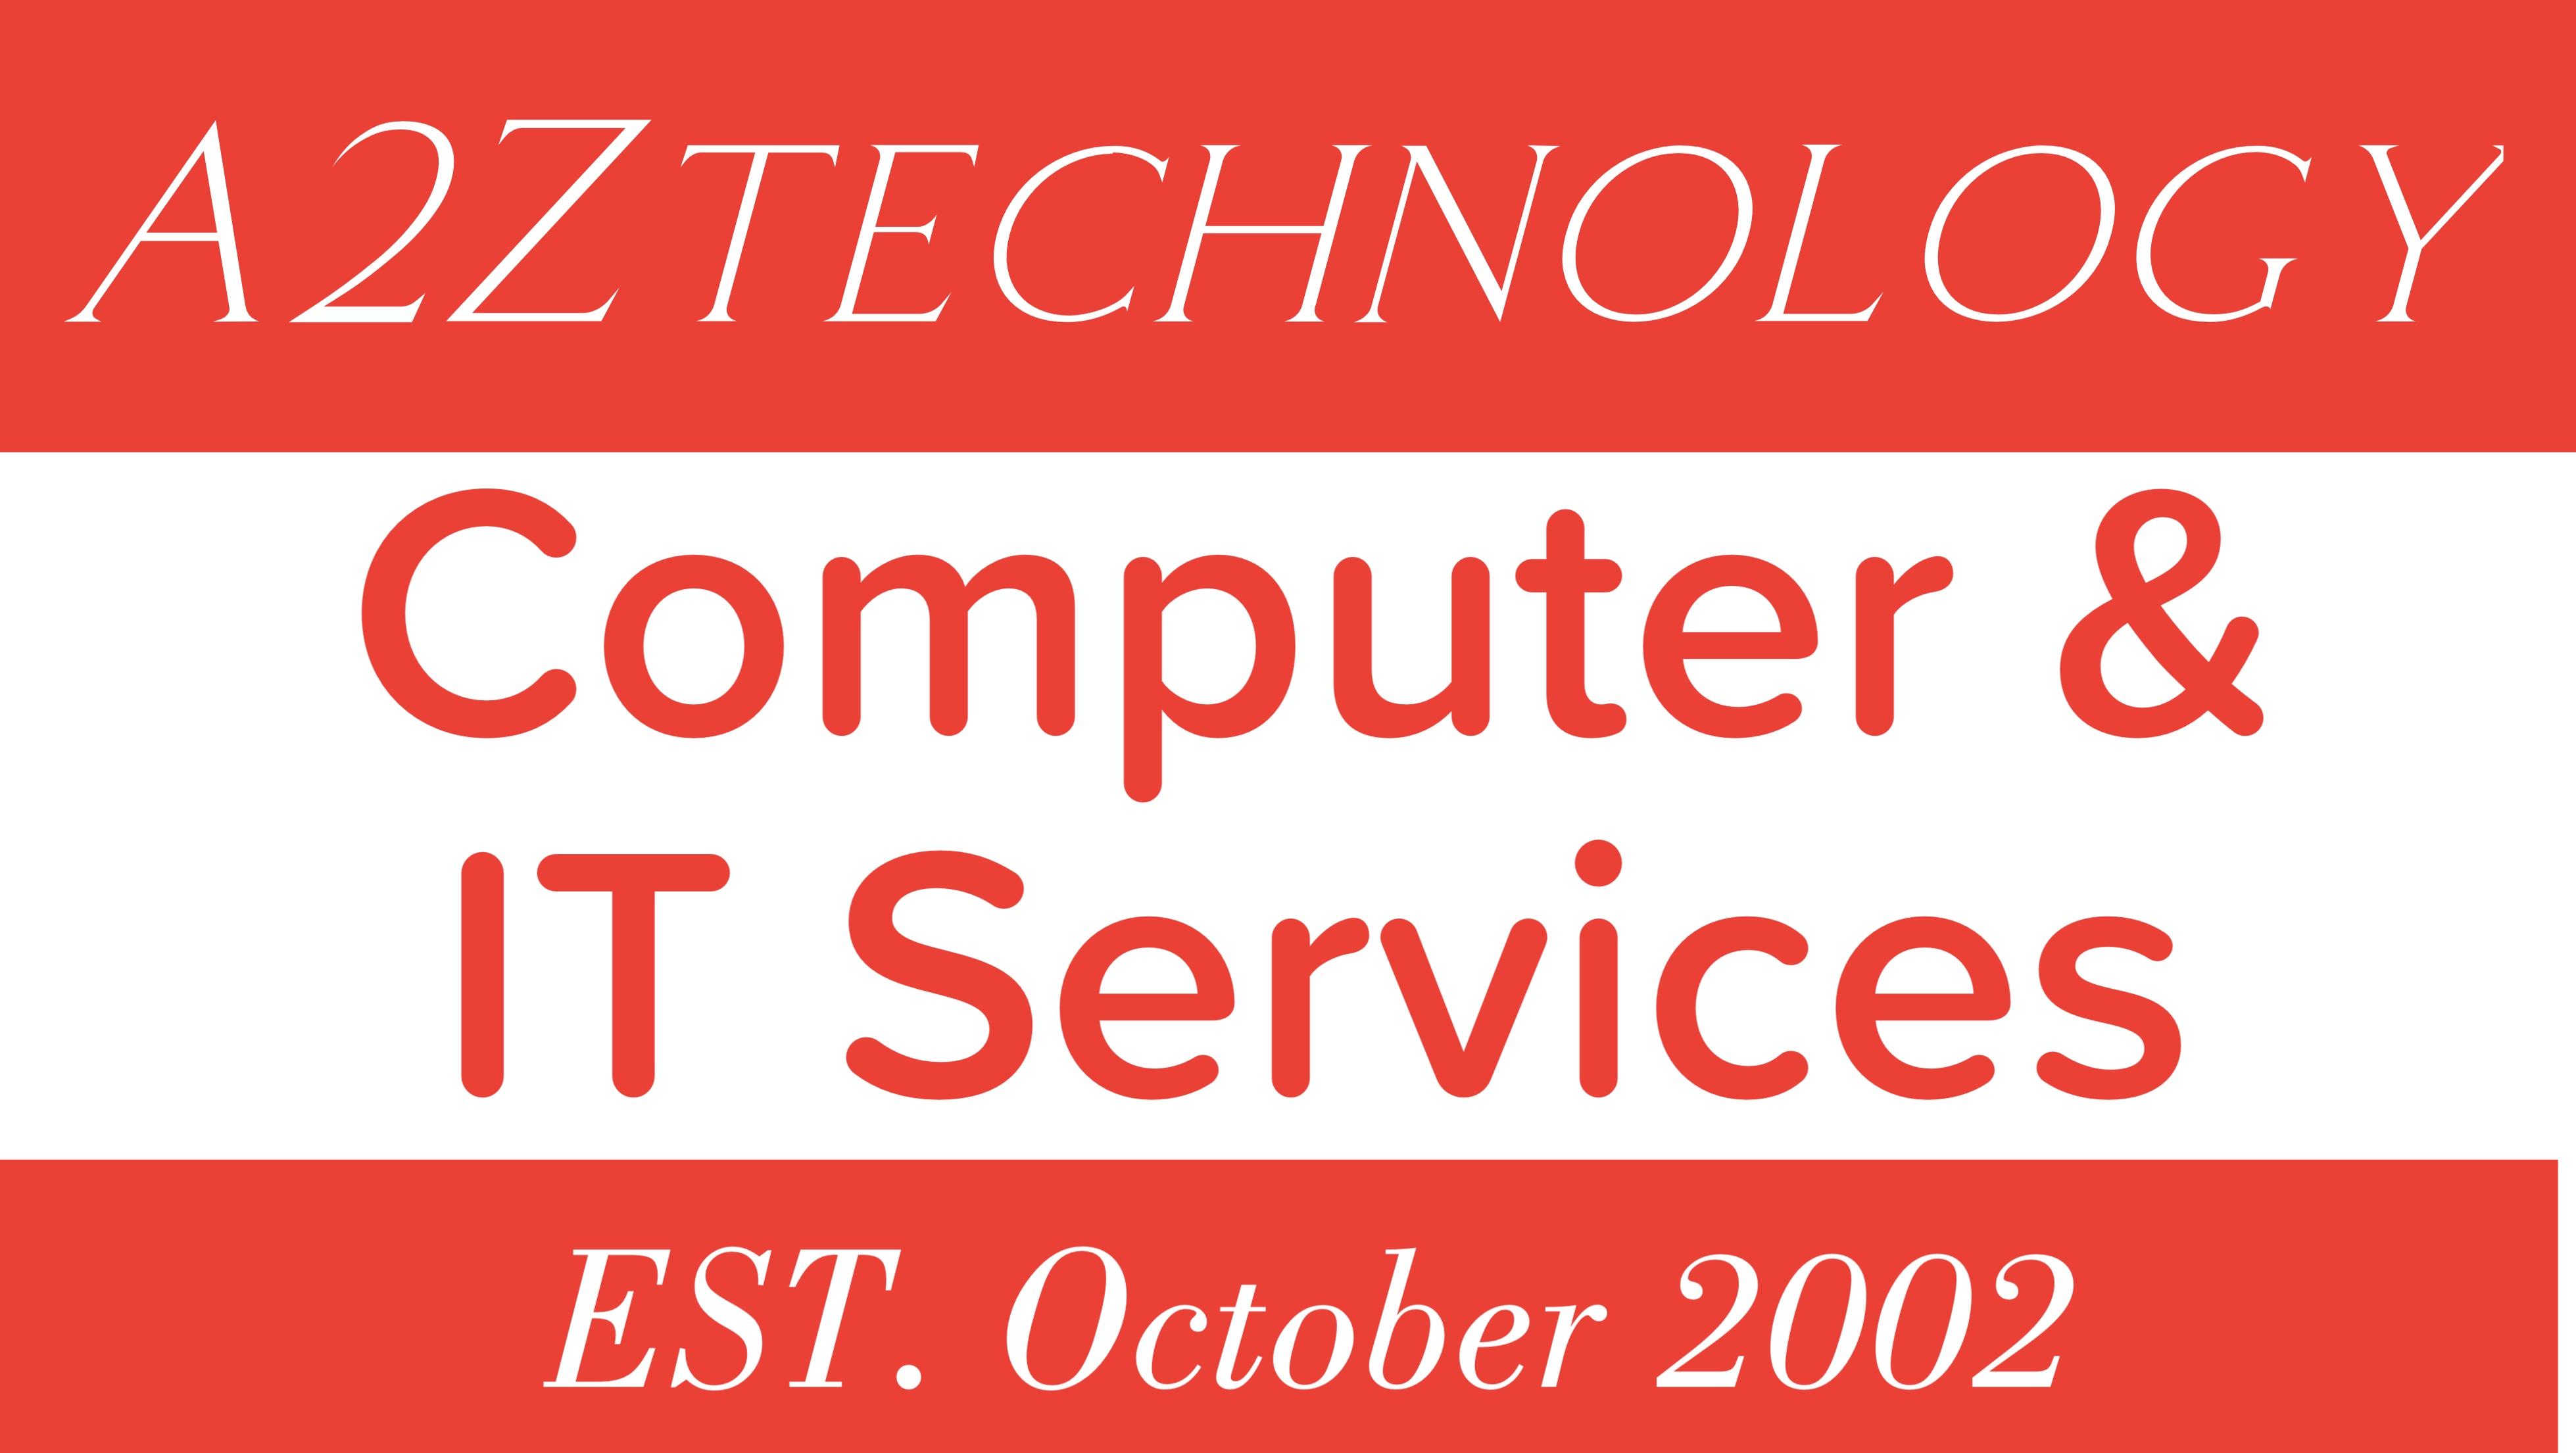 A2Ztechnology